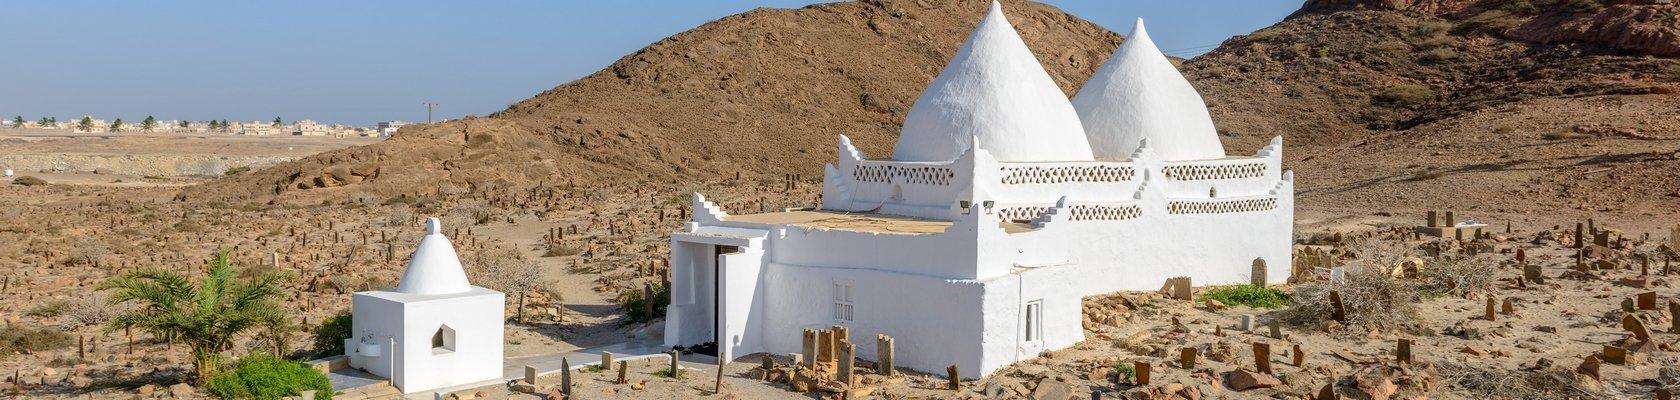 Bin Ali's tomb, Salalah